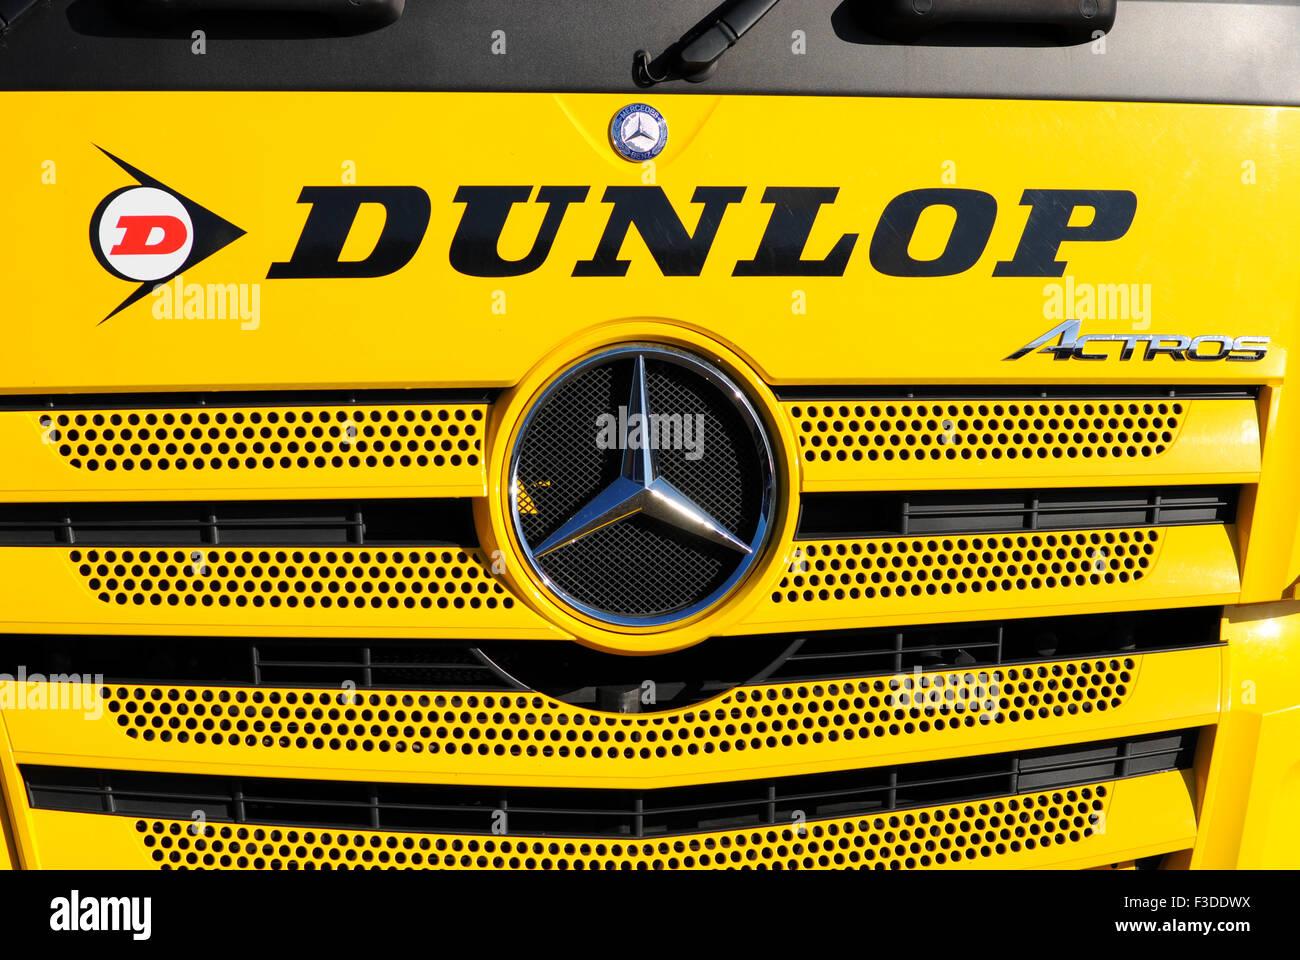 dunlop advertising stock photos amp dunlop advertising stock